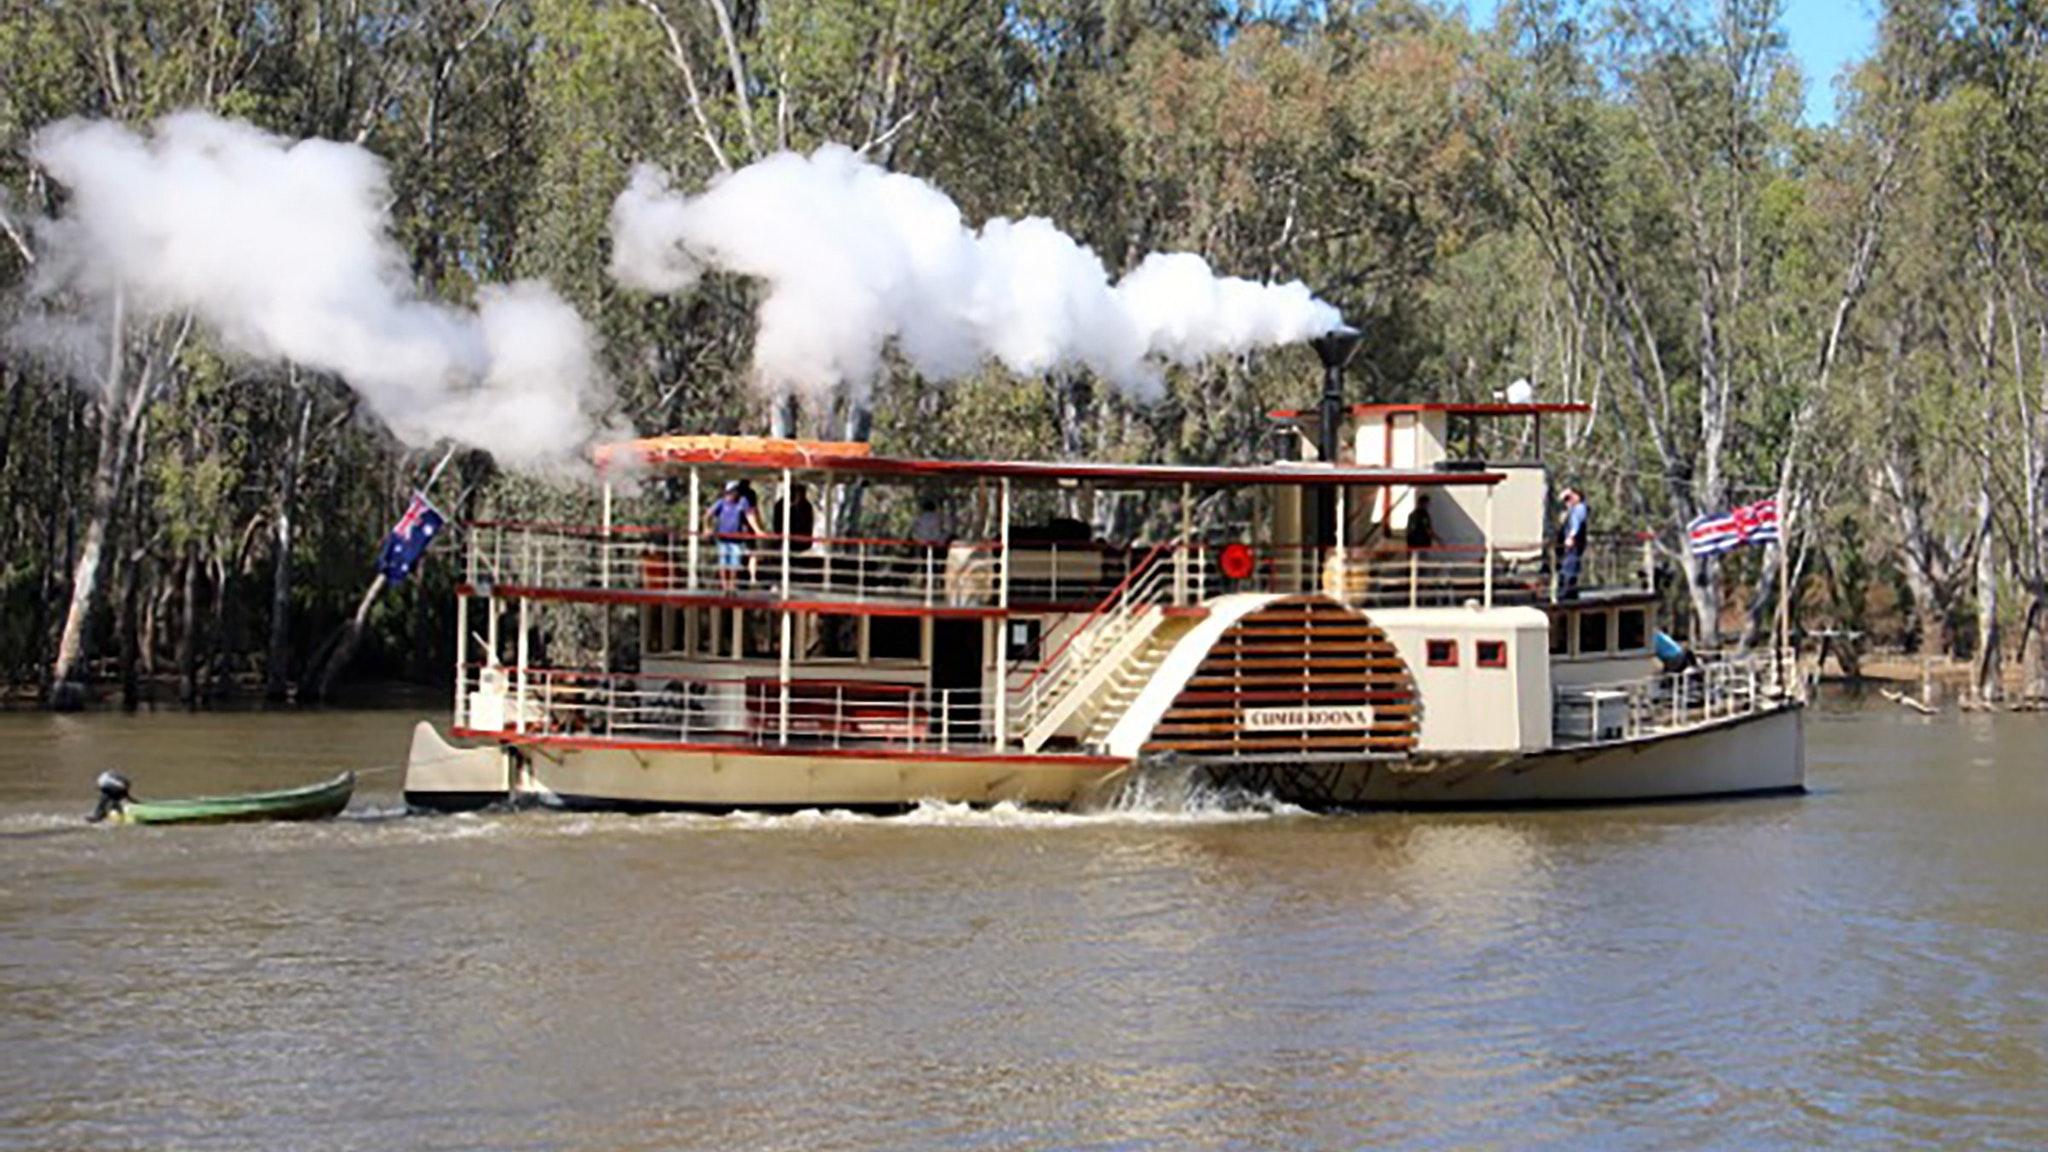 Captain's Scenic Cruise